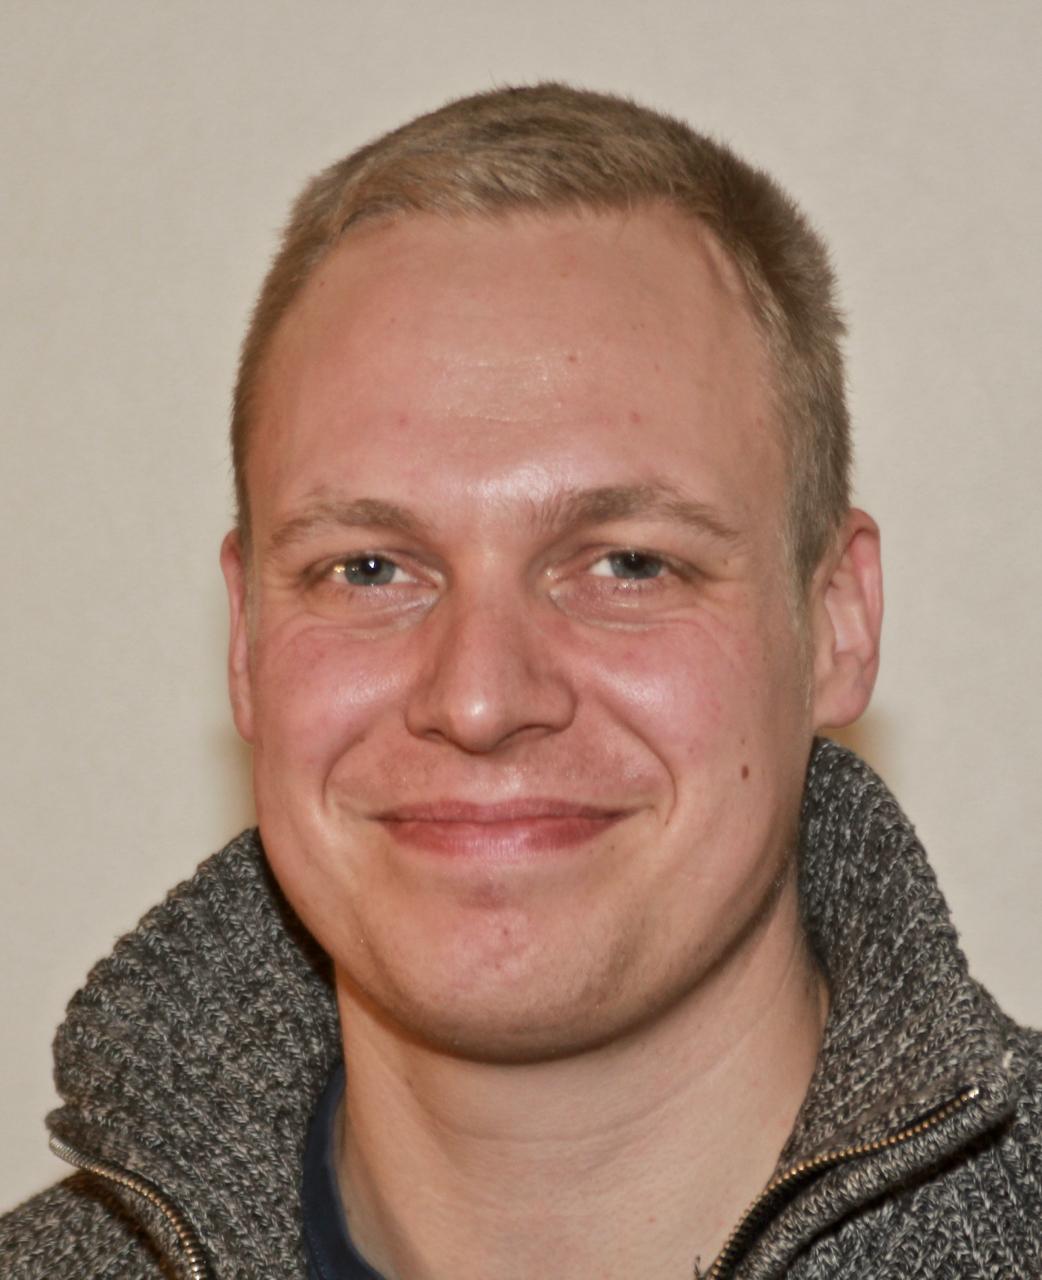 Anders Riis